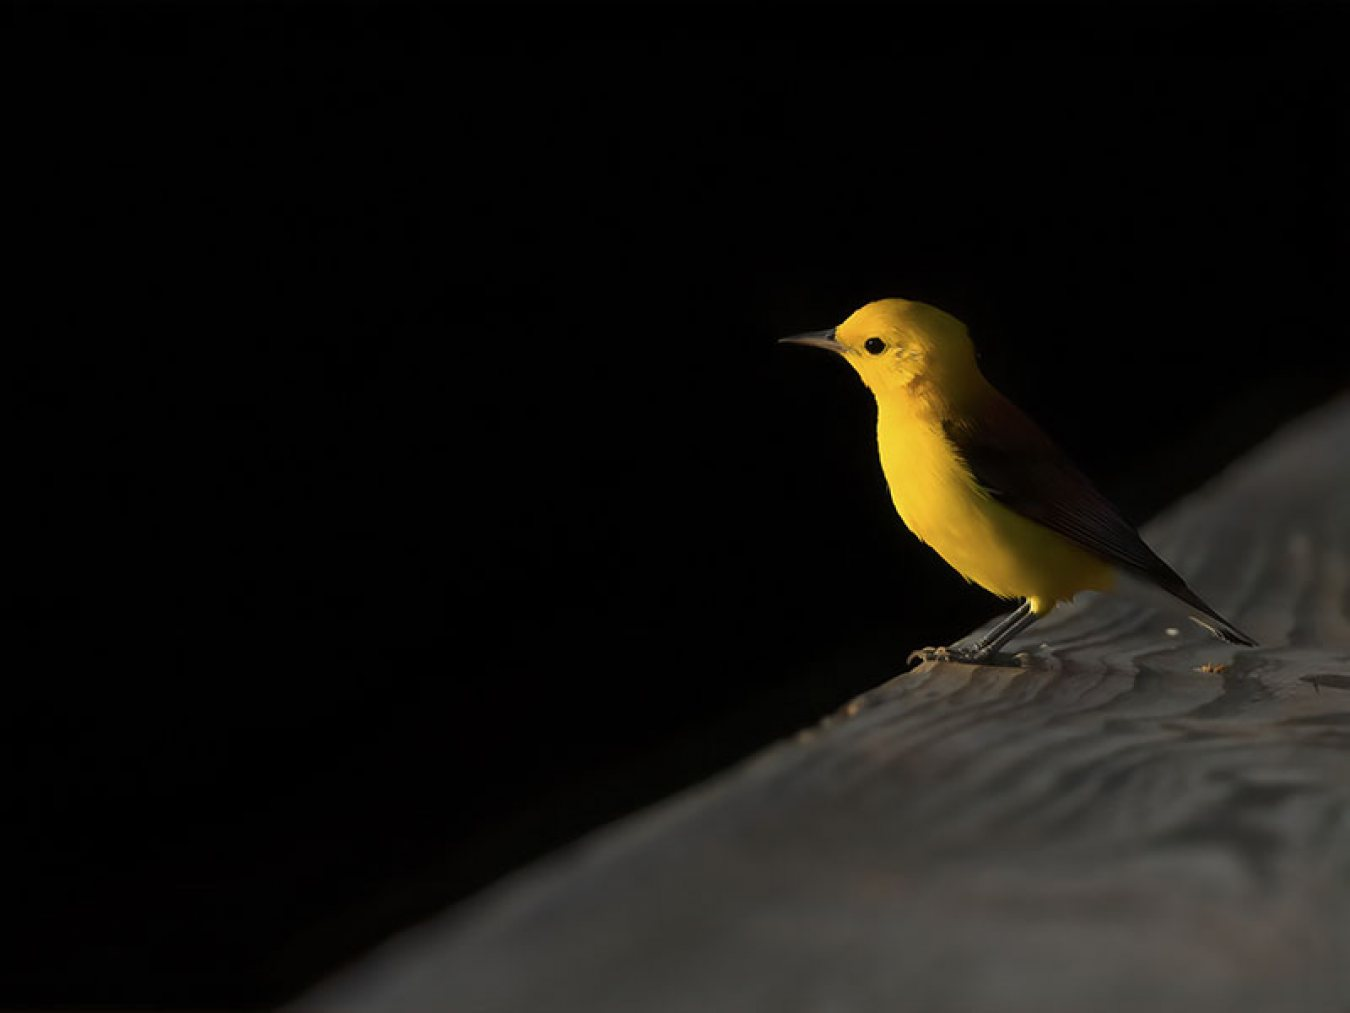 Prothonotary Warbler by Janaki Wallooppillai